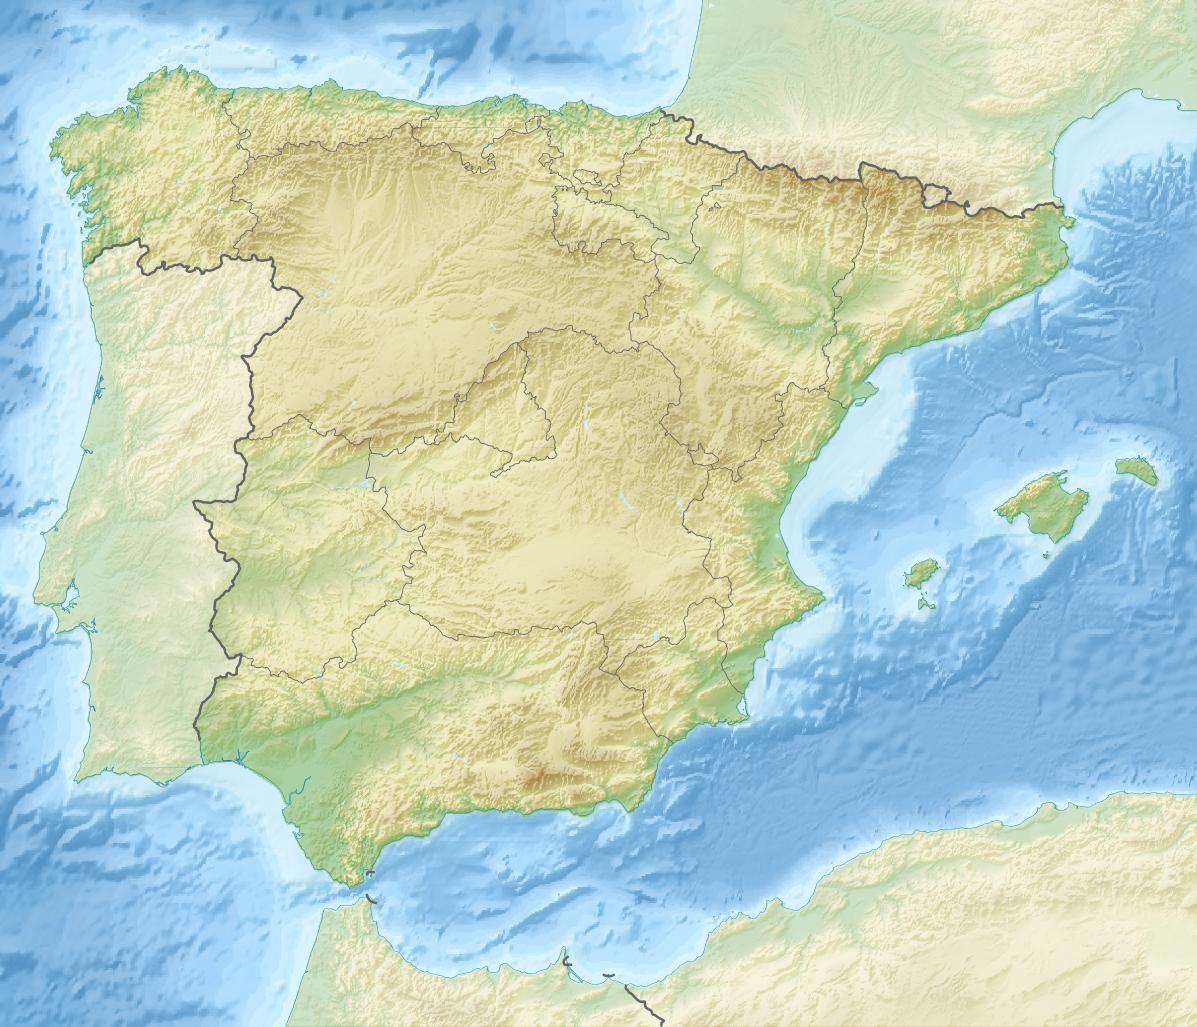 Carte Espagne Topographique.Espagne Topographique Carte Populationdata Net